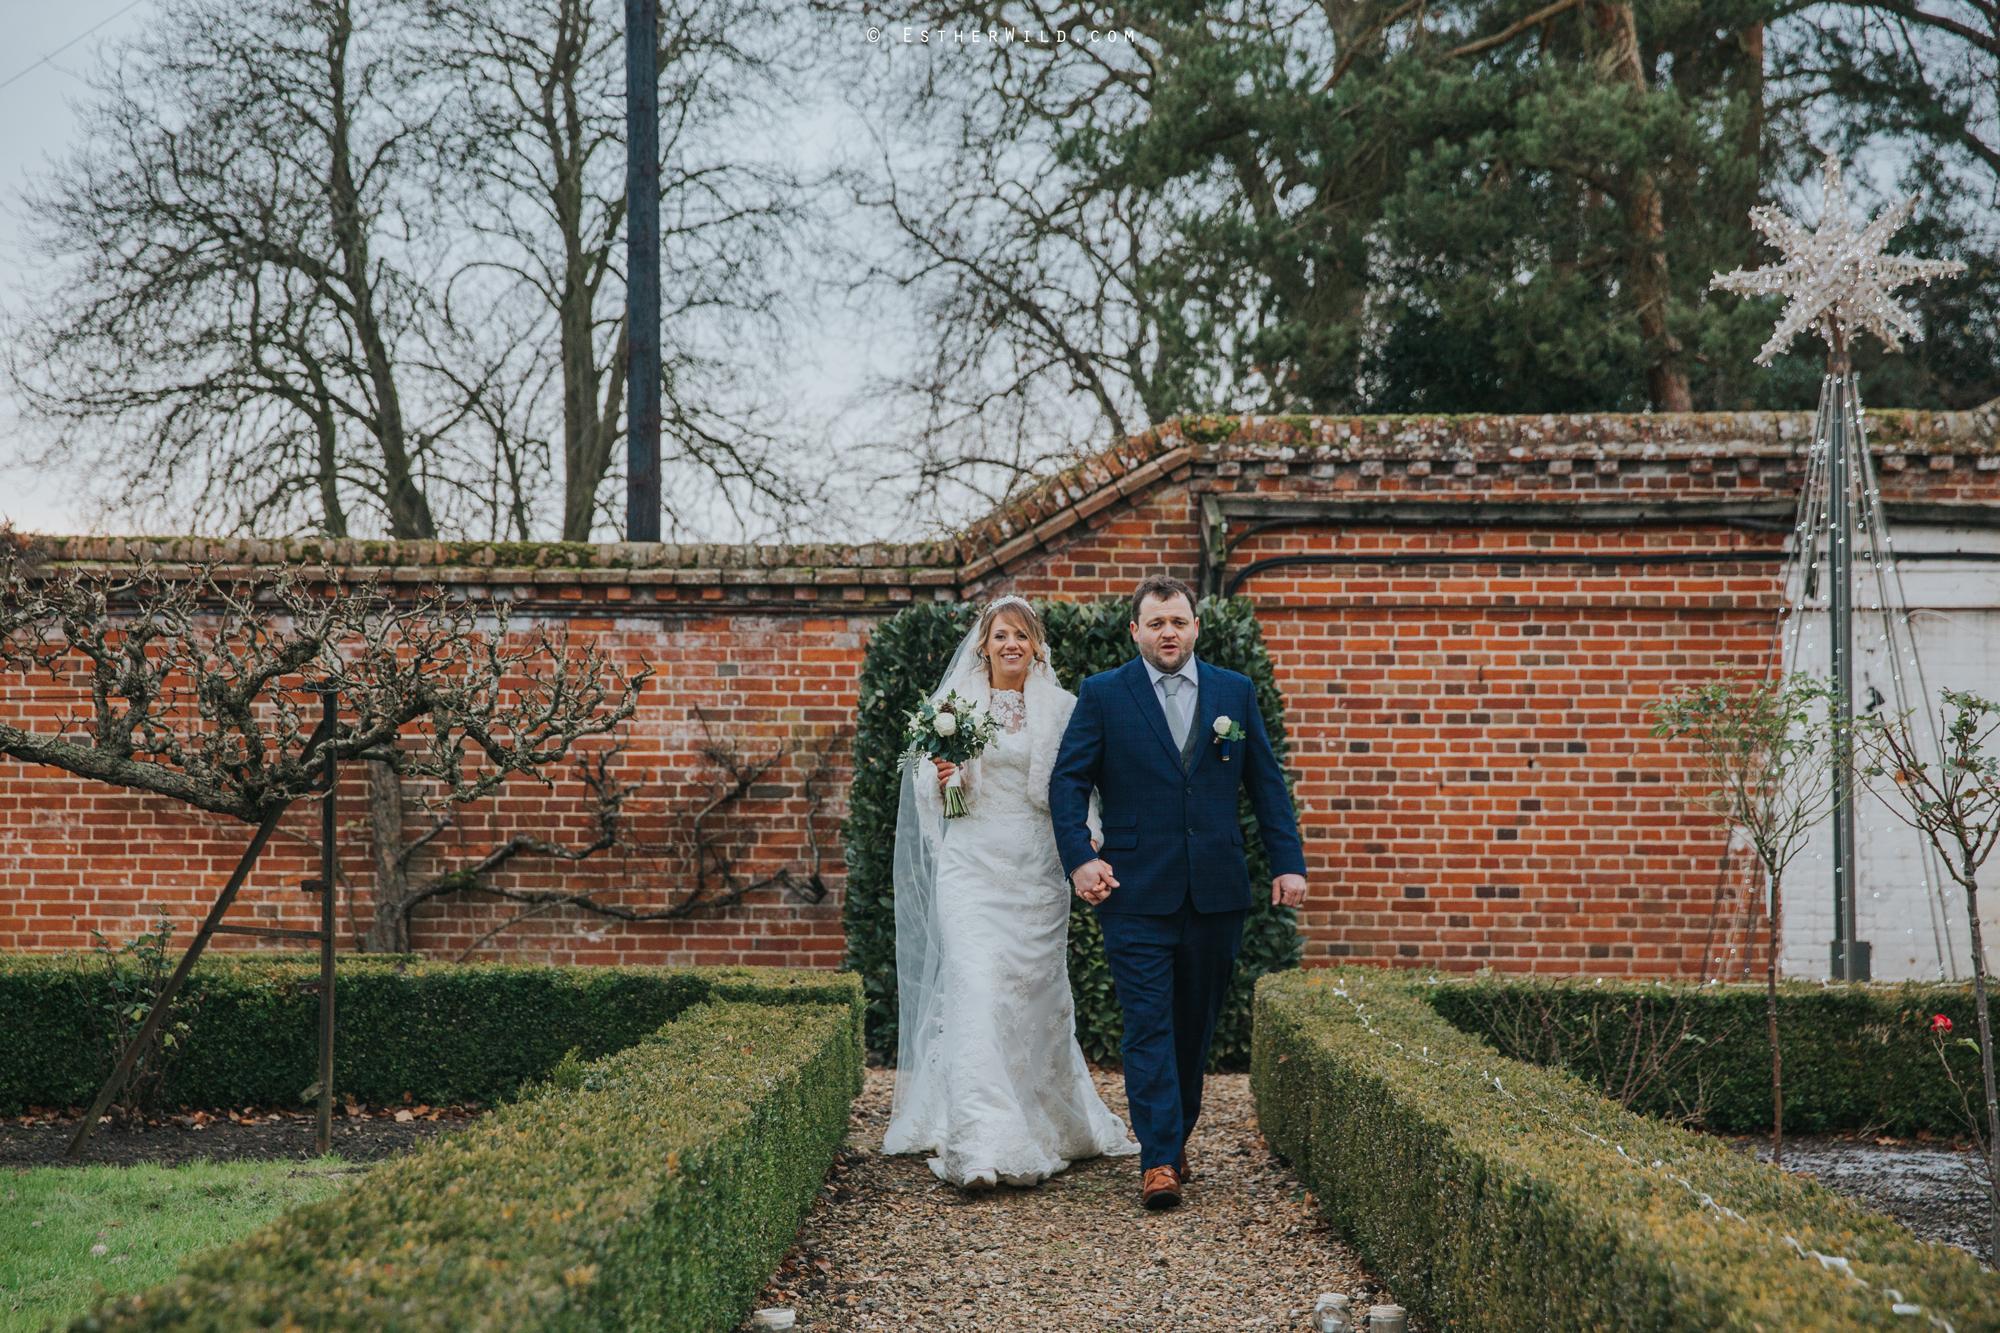 Wedding_Photography_Diss_Gawdy_Hall_Redenhall_Church_Norfolk_Winter_Esther_Wild_Copyright_IMG_1885.jpg